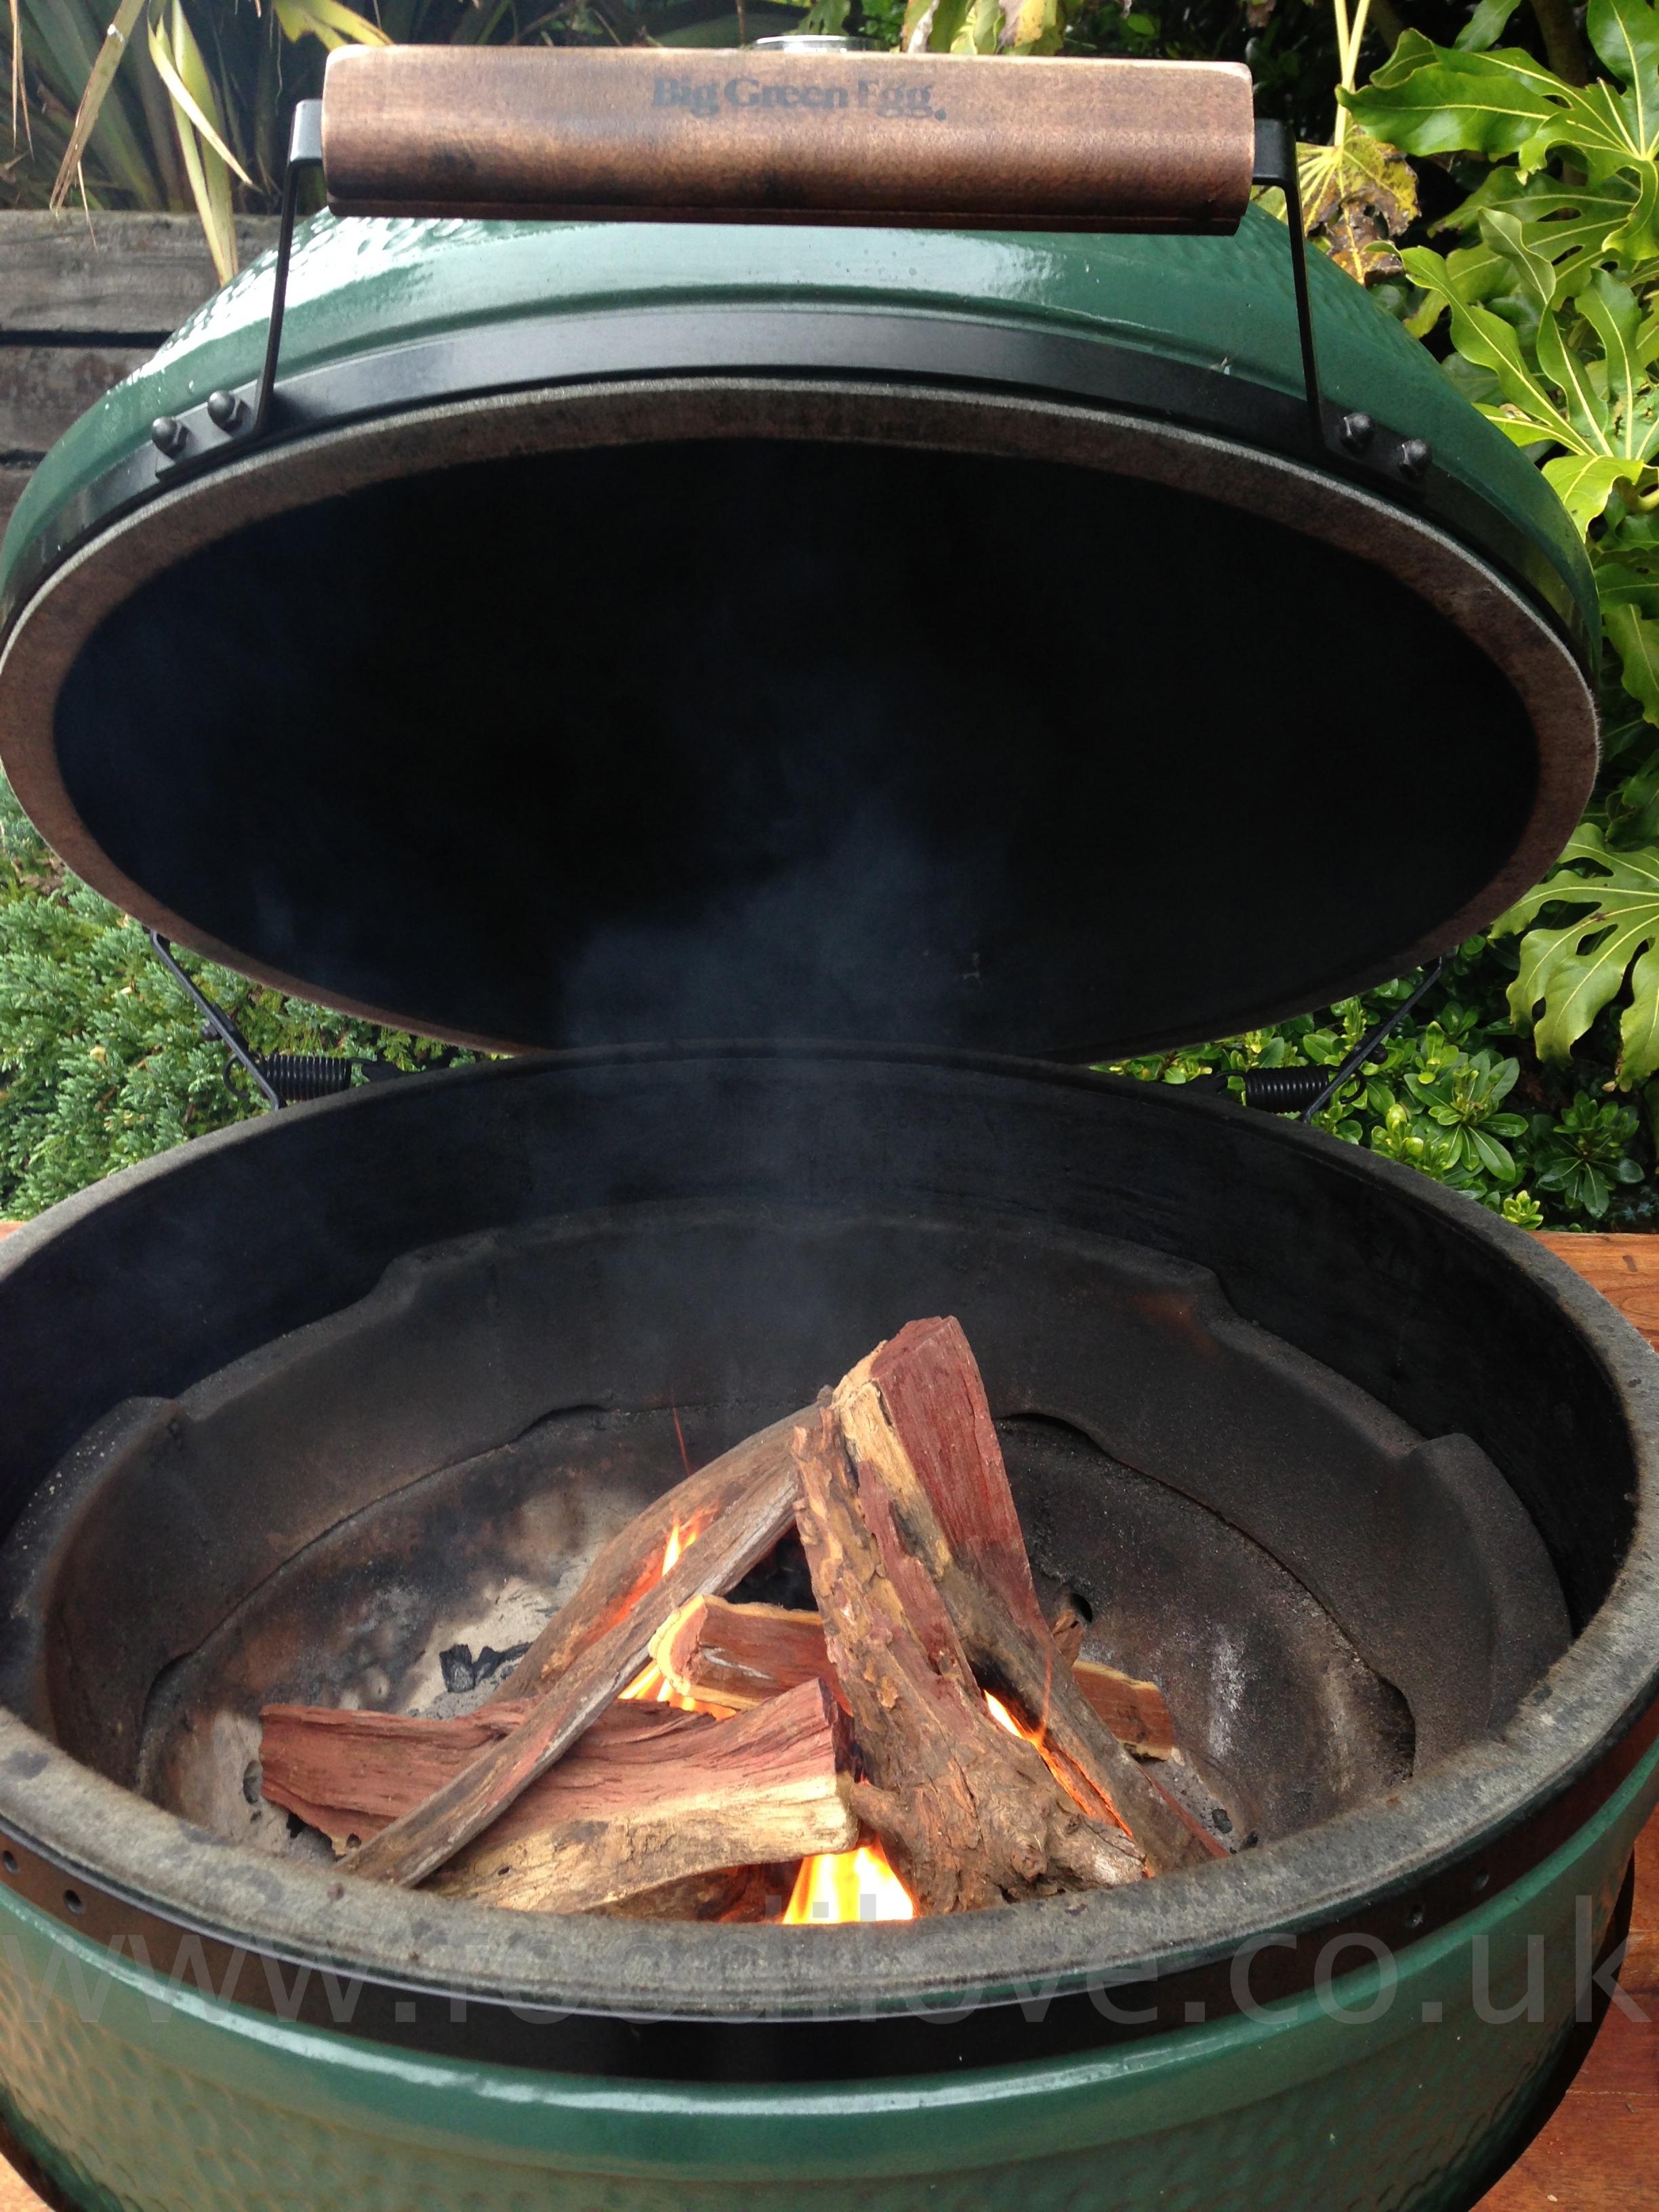 Rib Eye Steak on the Braai/BigGreenEgg using Kameeldoring Wood